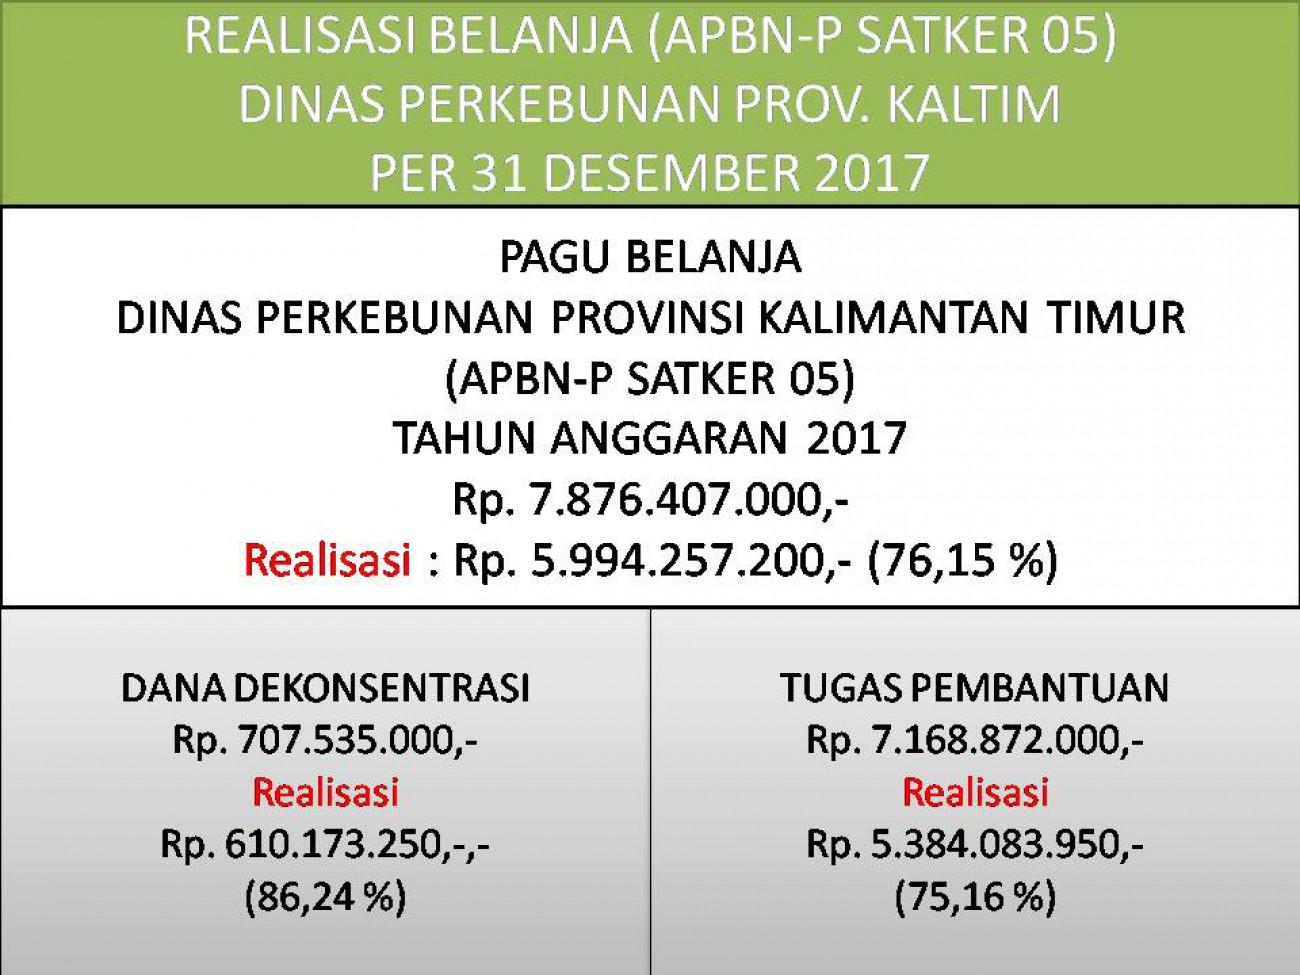 Laporan Realisasi APBN-P Satker 05 (Direktorat Jenderal Perkebunan) Dinas Perkebunan Prov. Kaltim Bulan Desember 2017